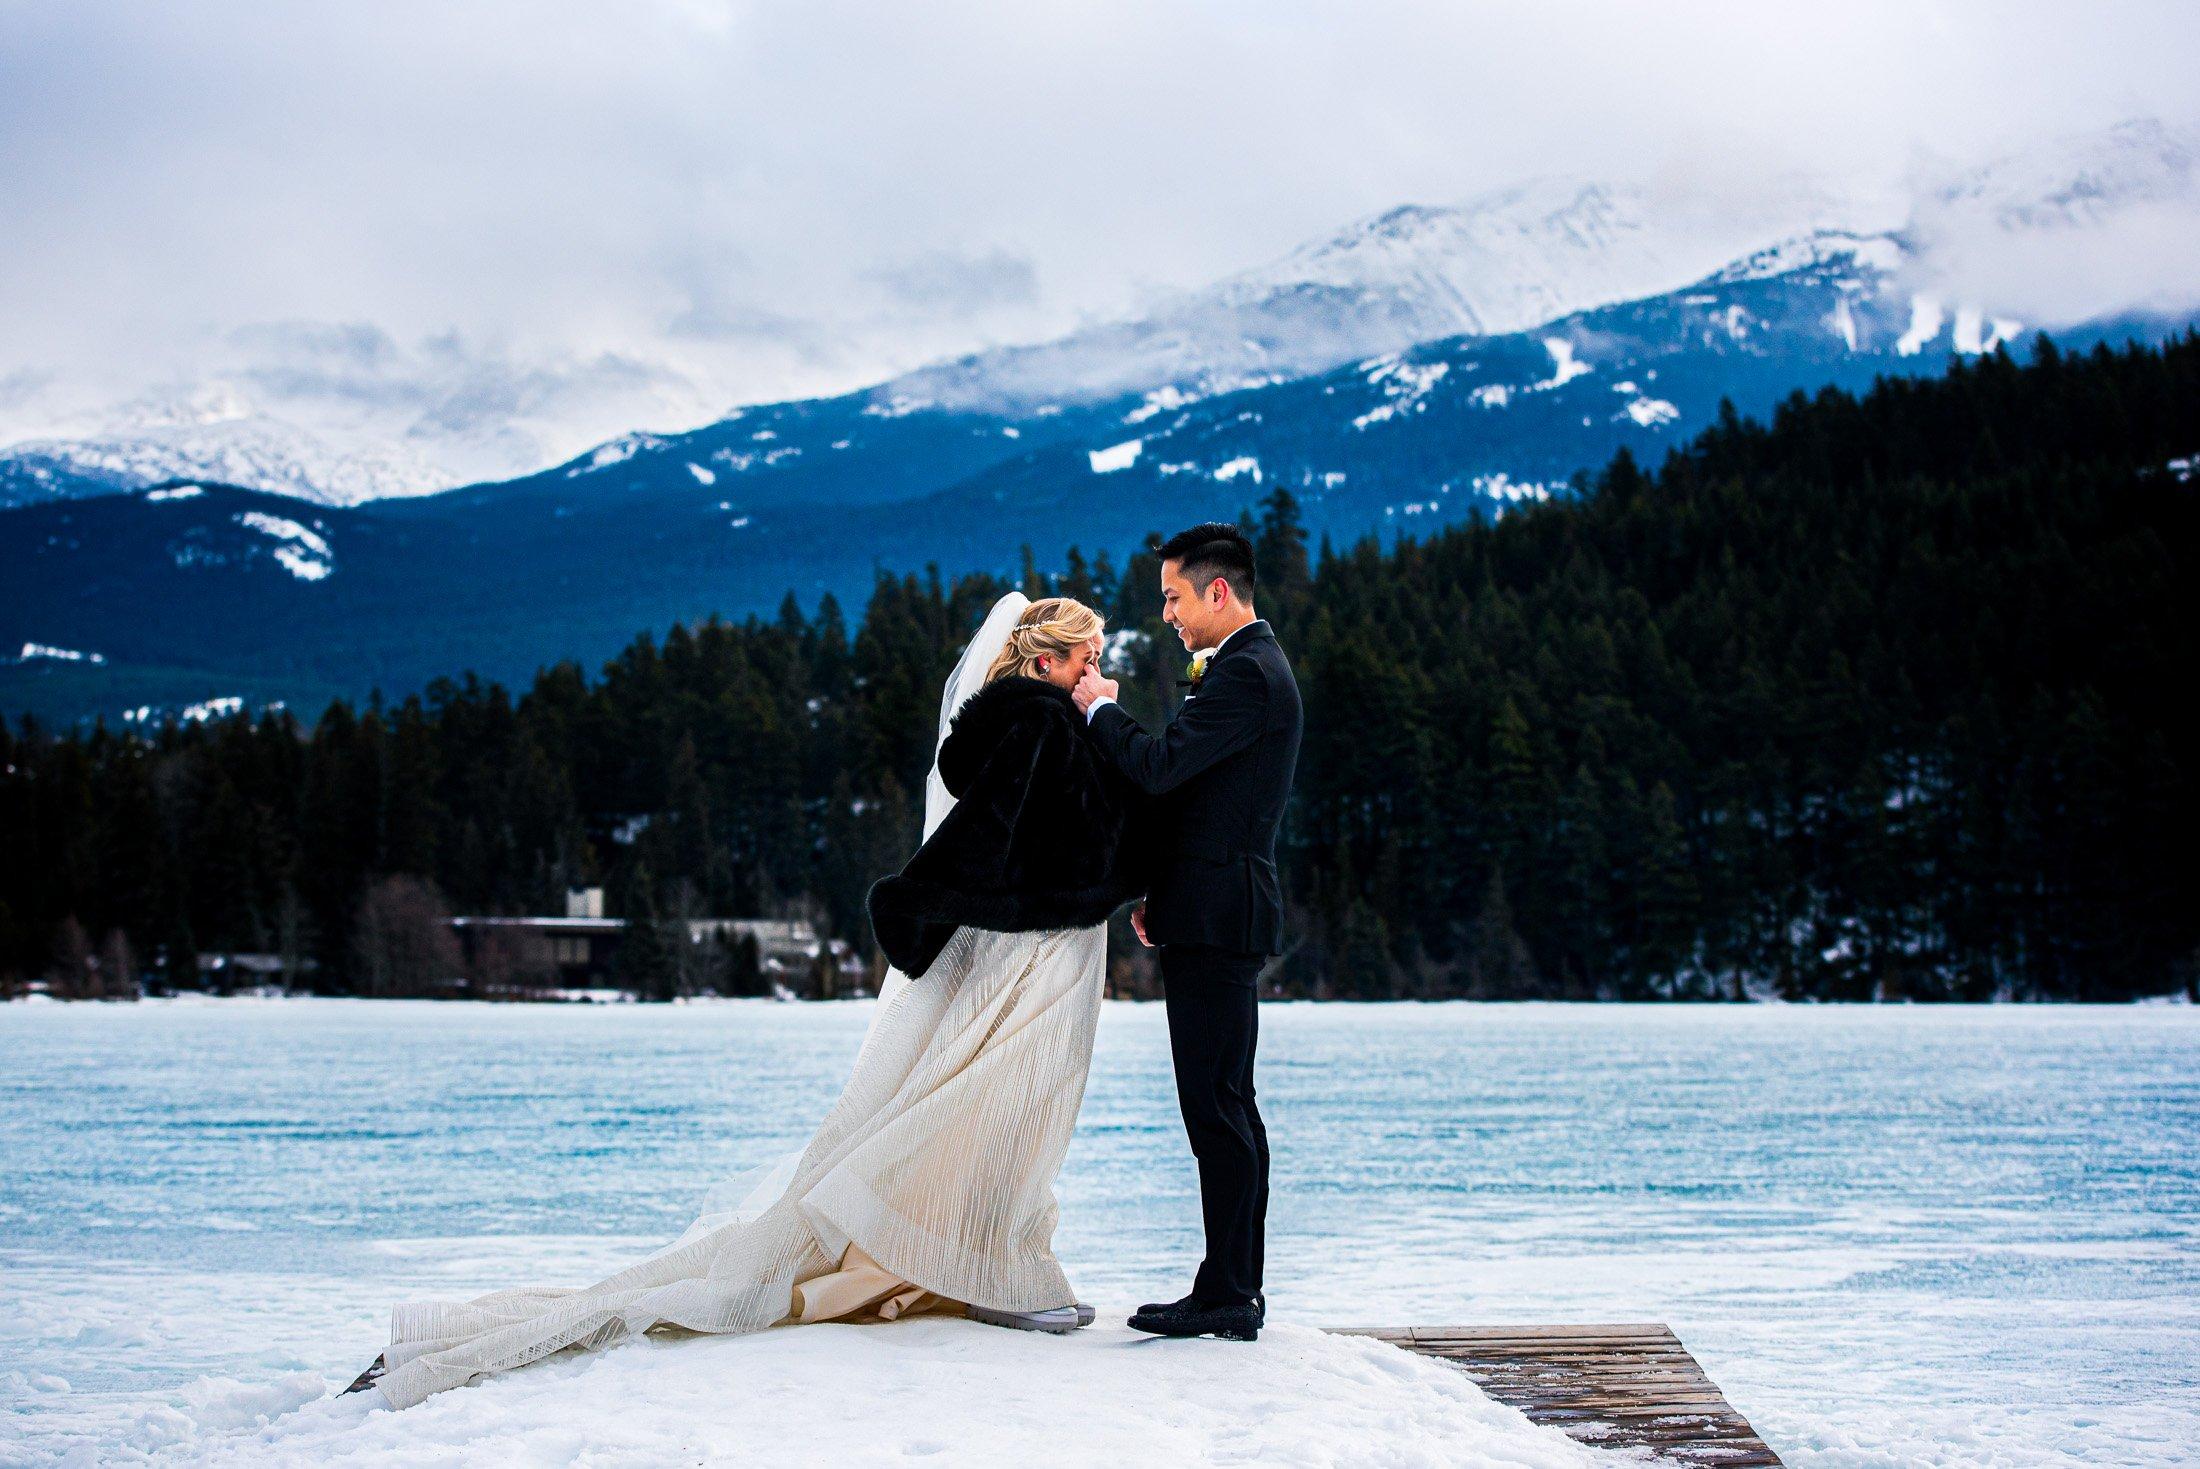 089 - whistler wedding photographer